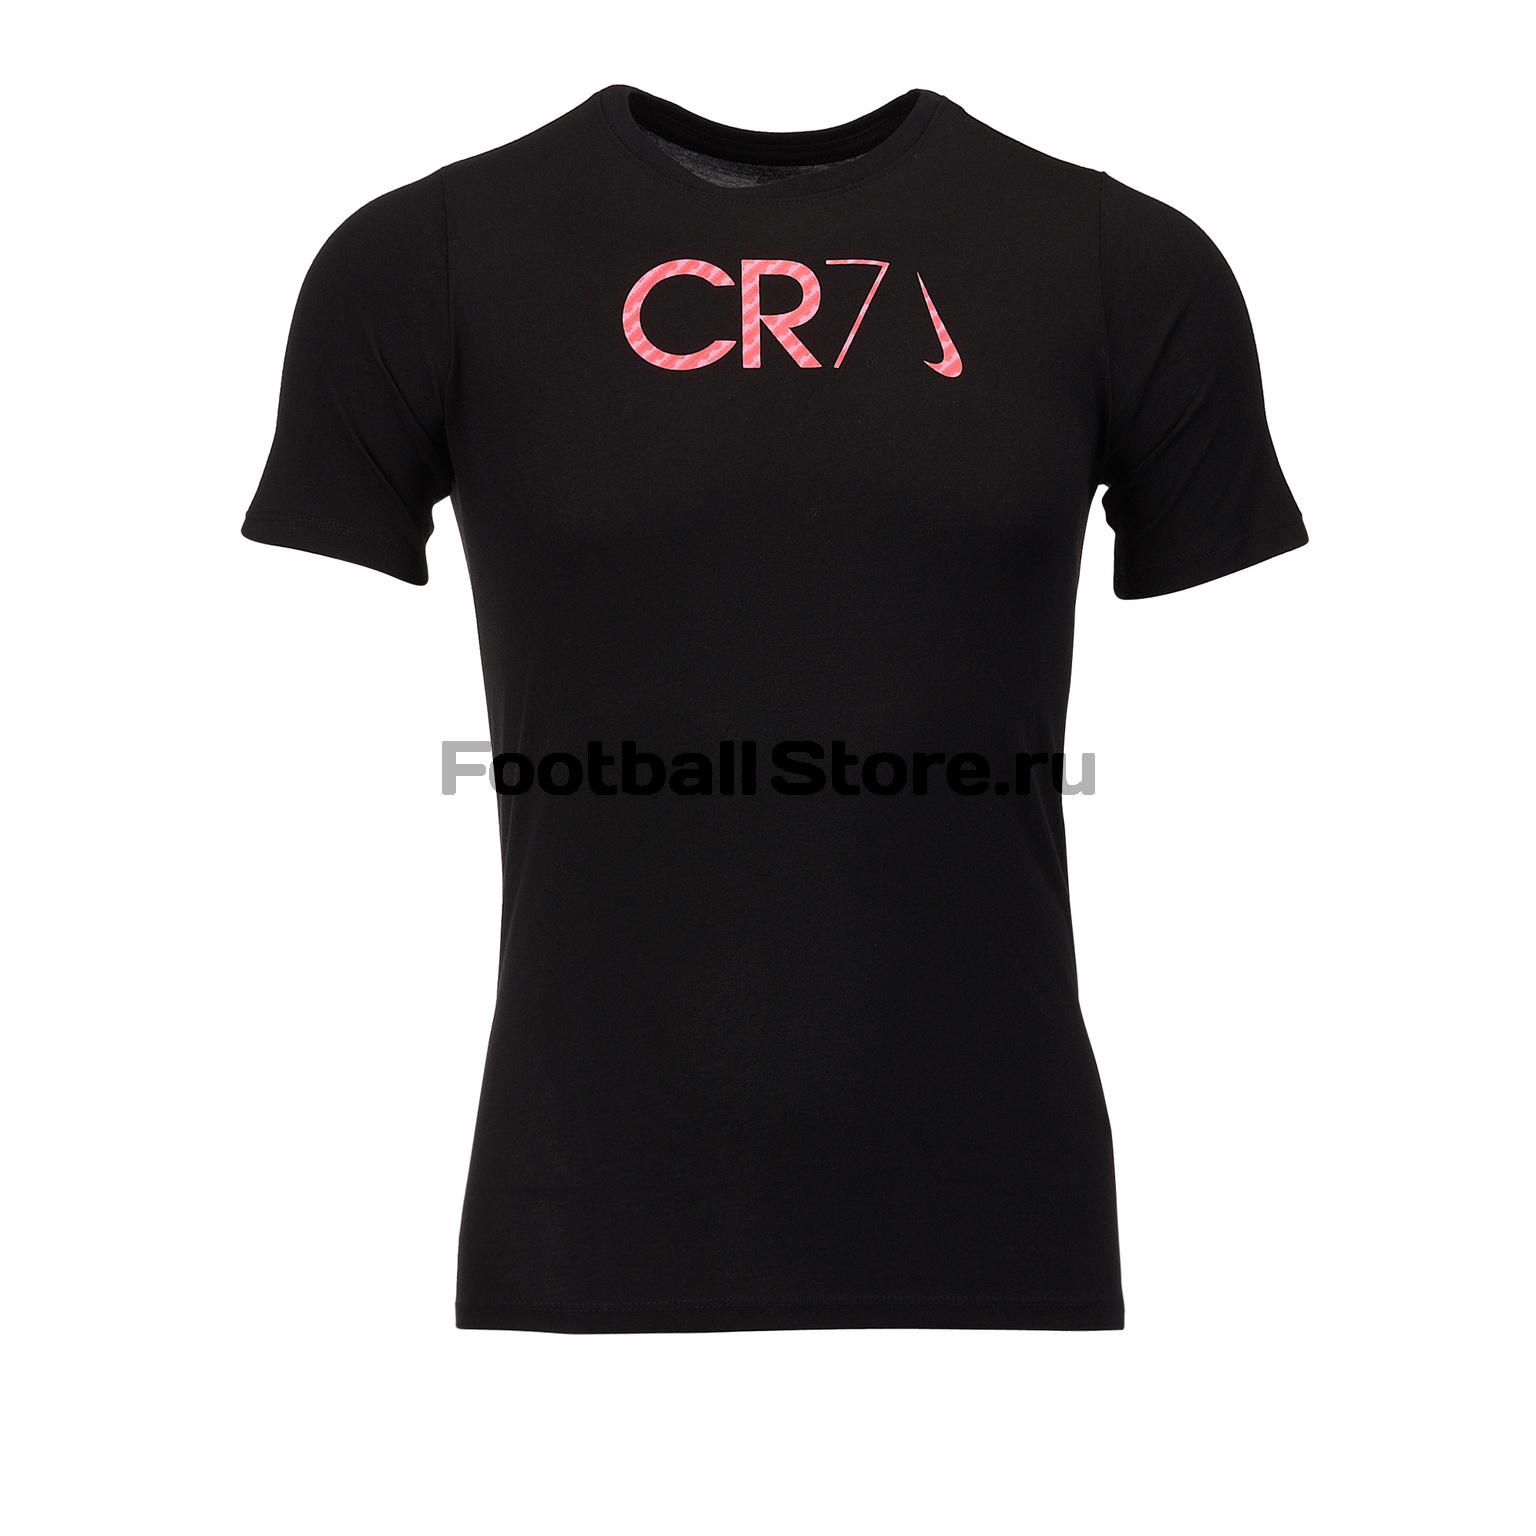 Футболка подростковая Nike CR7 NK DRY AV6131-010 цена